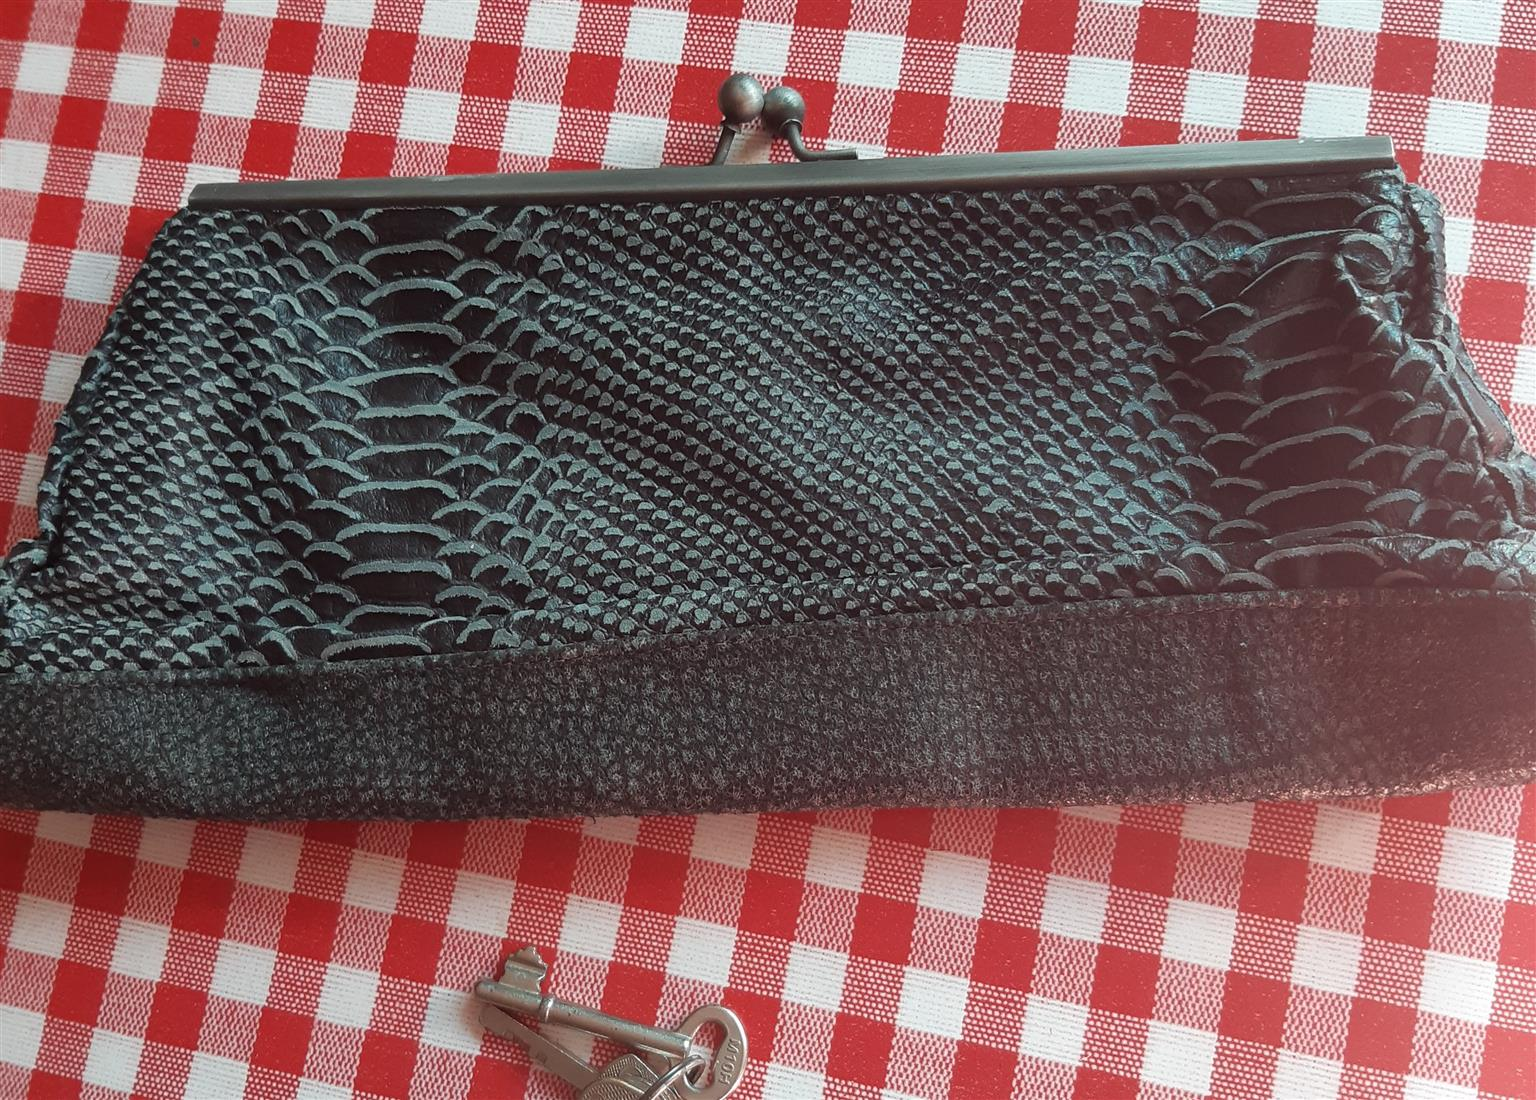 Vintage Clutch Bag by Designer Edith Pittier, Brazil